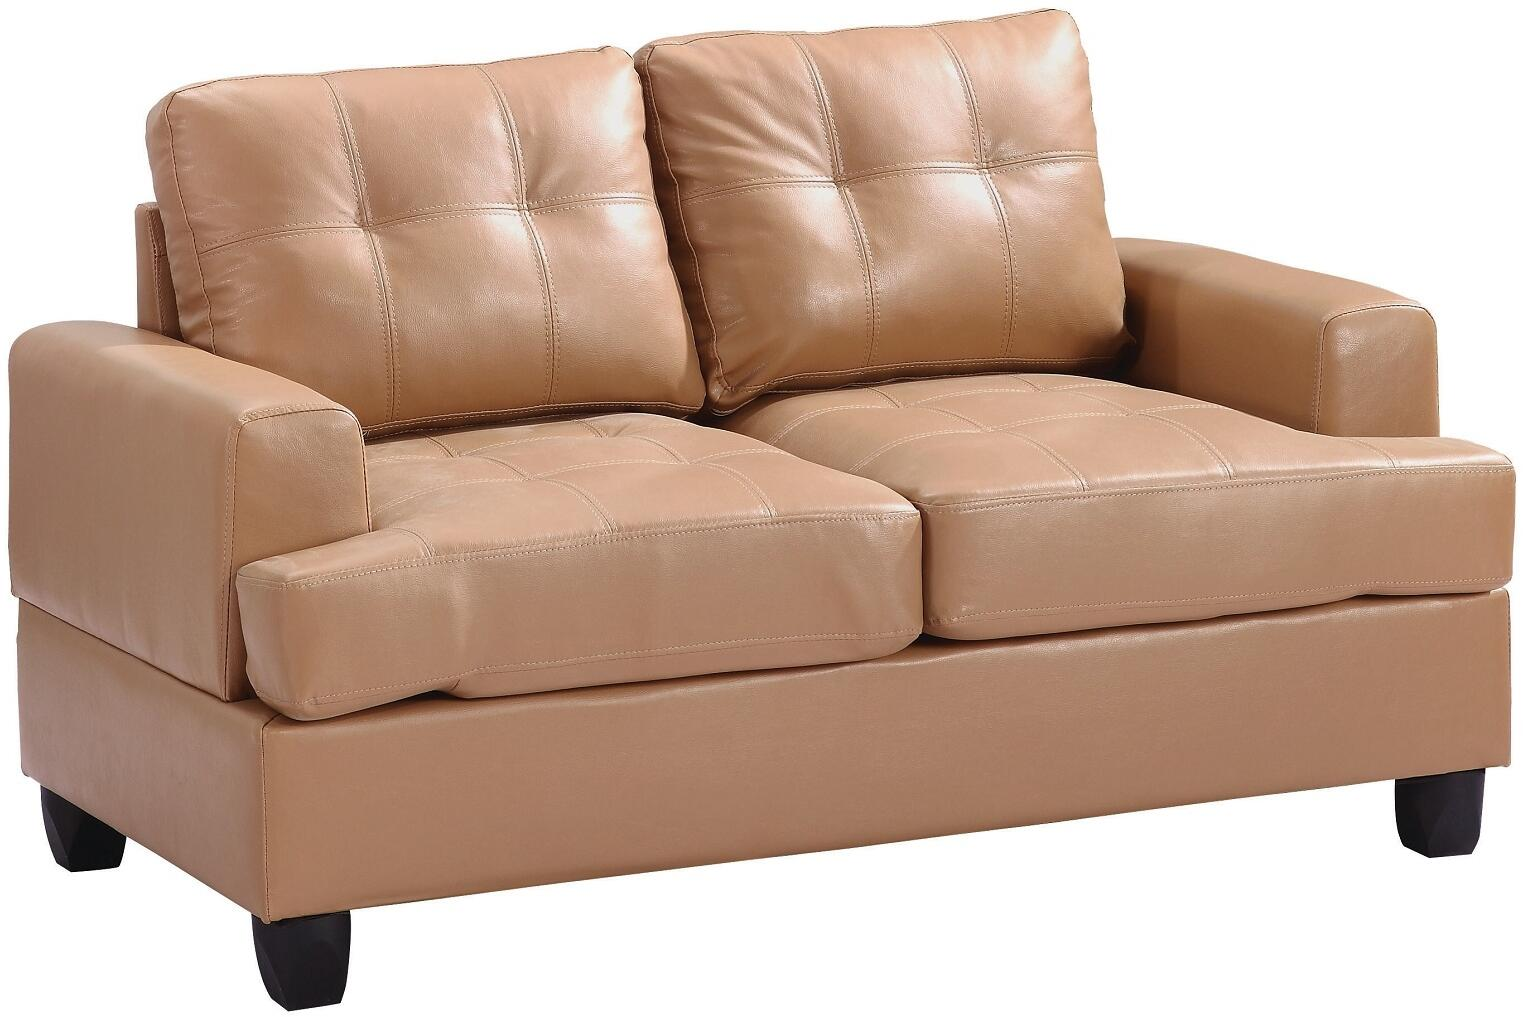 Glory furniture g581aset living room sets appliances for Furniture connection